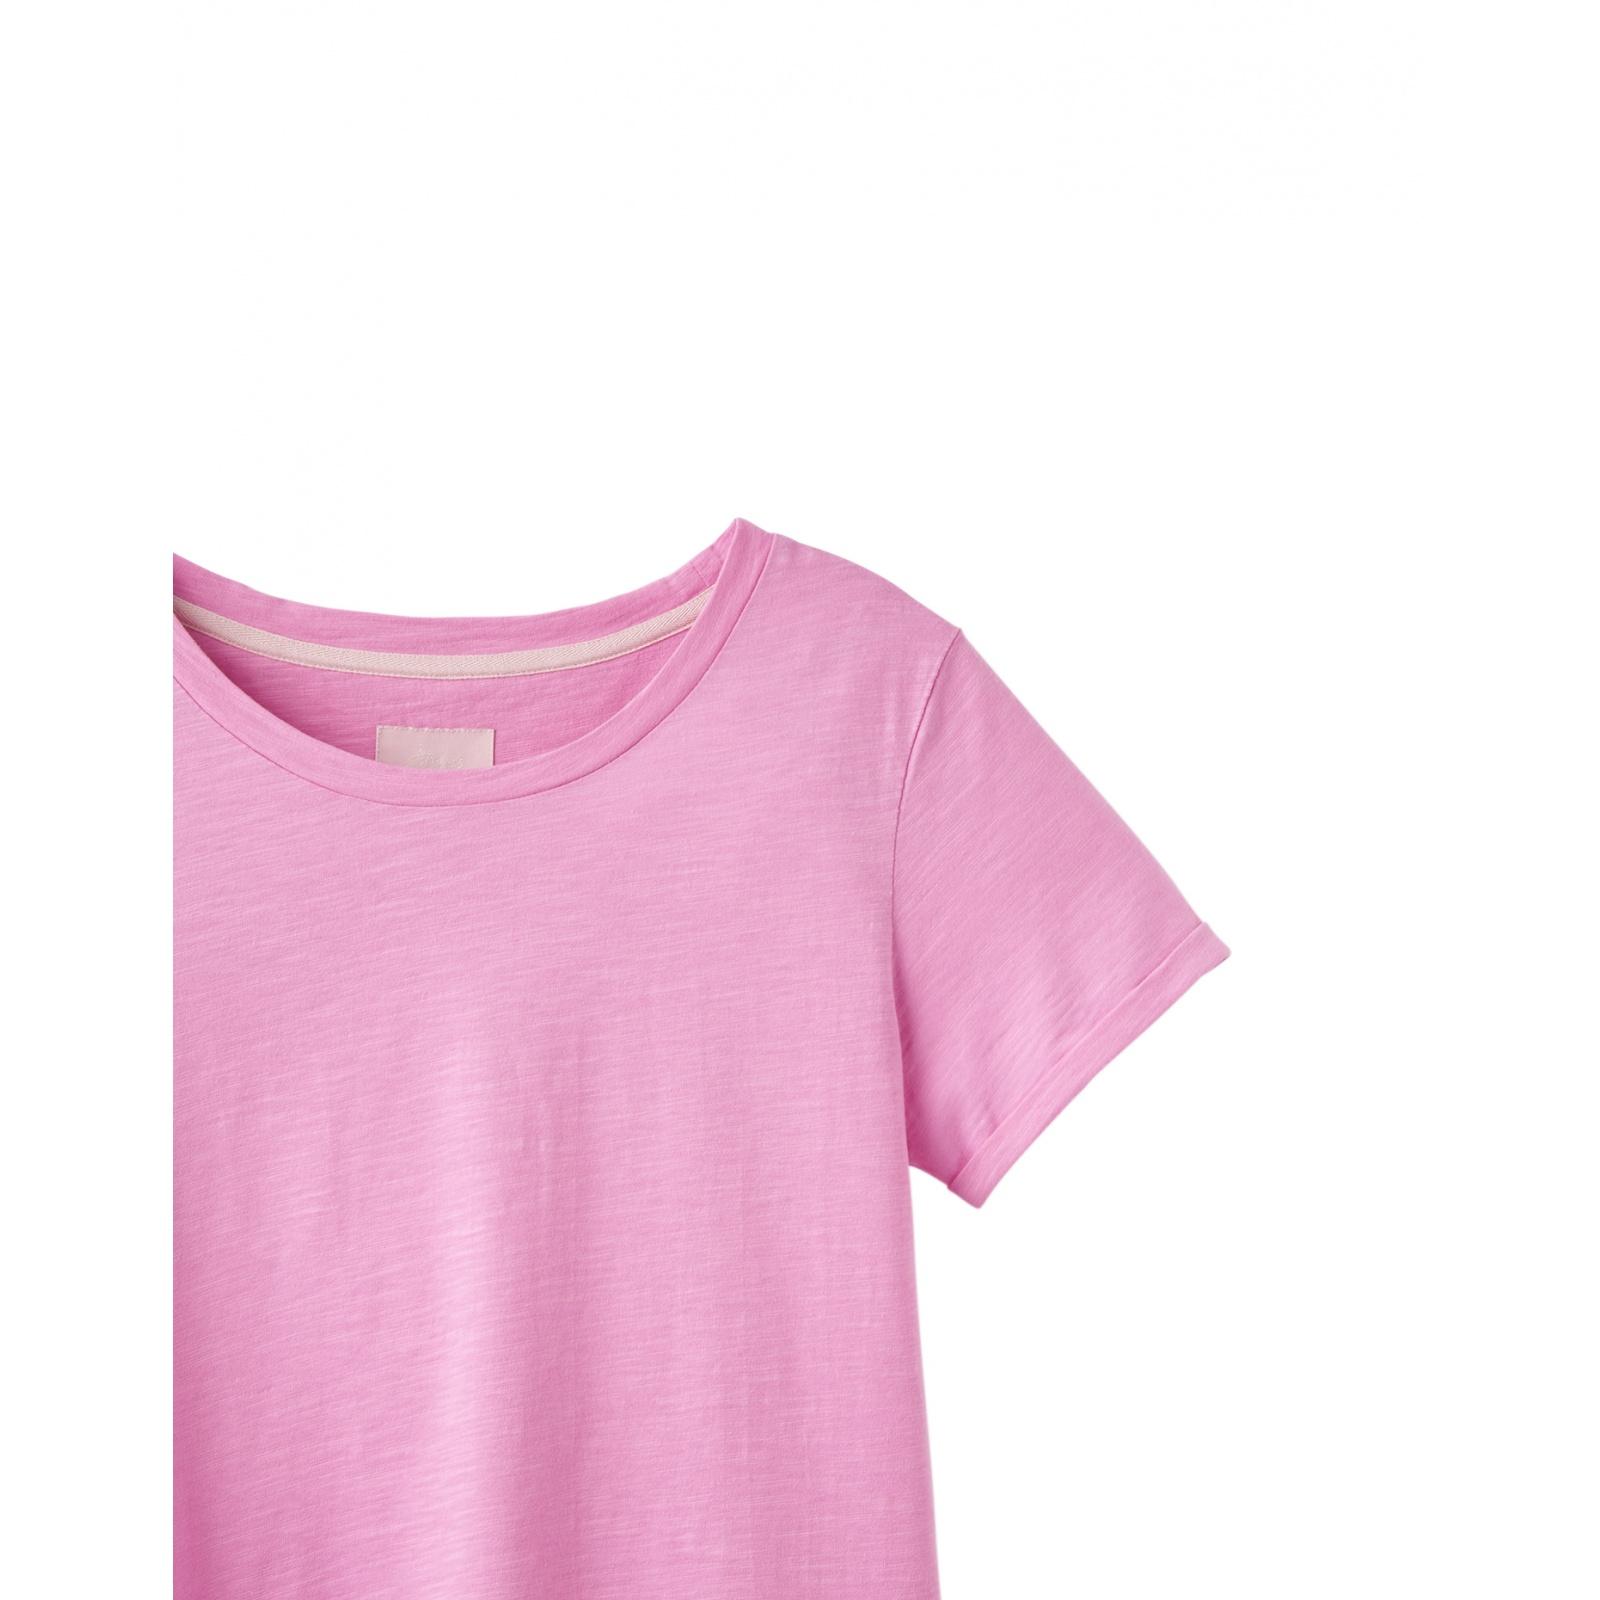 Joules-Nessa-ligero-Jersey-Camiseta-SS19 miniatura 28